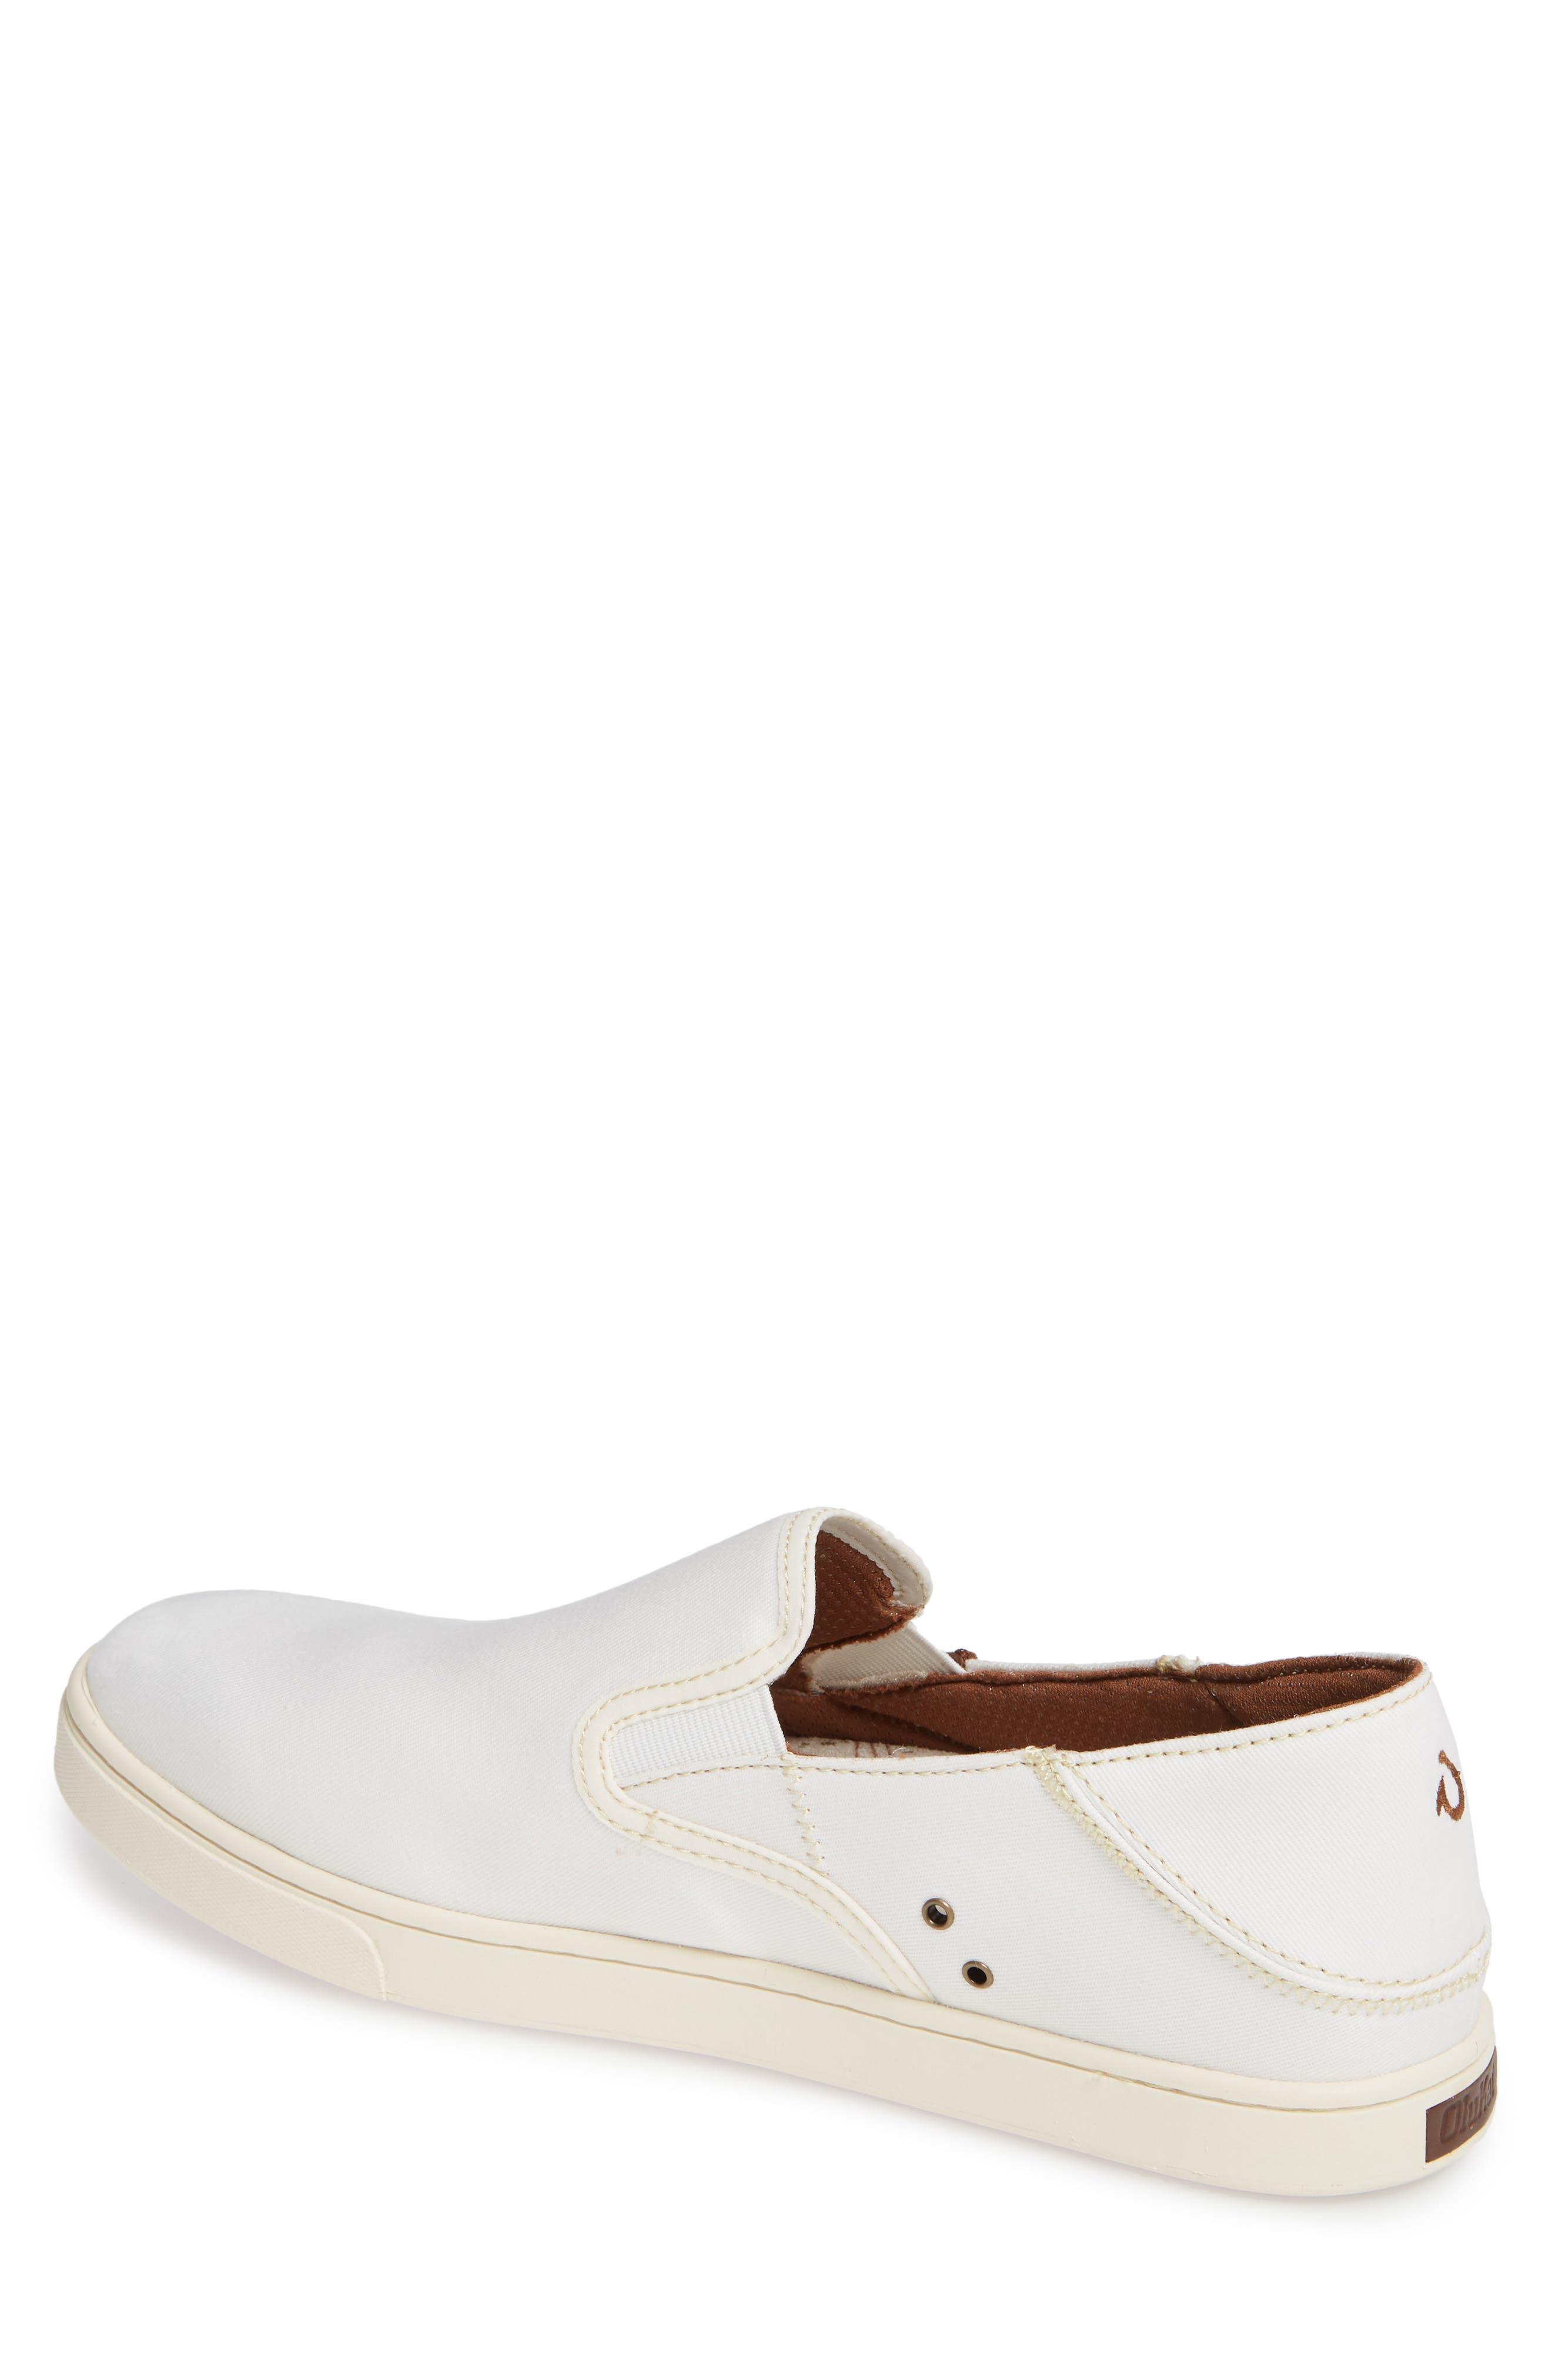 Kahu Collapsible Slip-On Sneaker,                             Alternate thumbnail 2, color,                             259